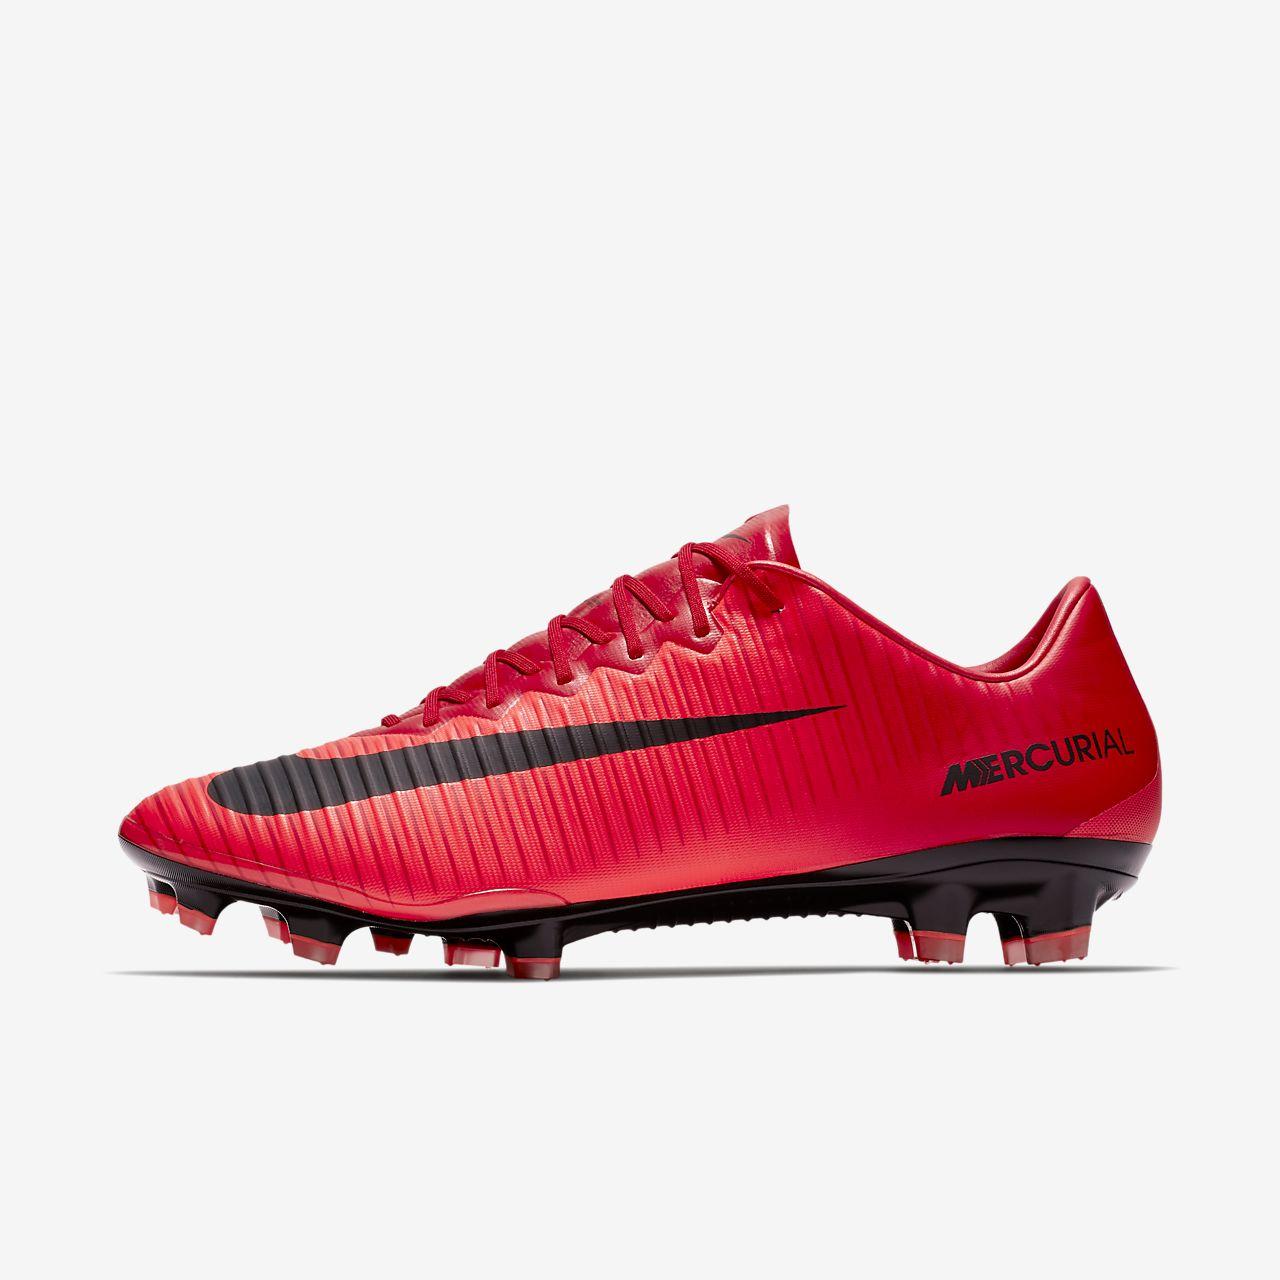 ... Nike Mercurial Vapor XI Firm-Ground Soccer Cleat